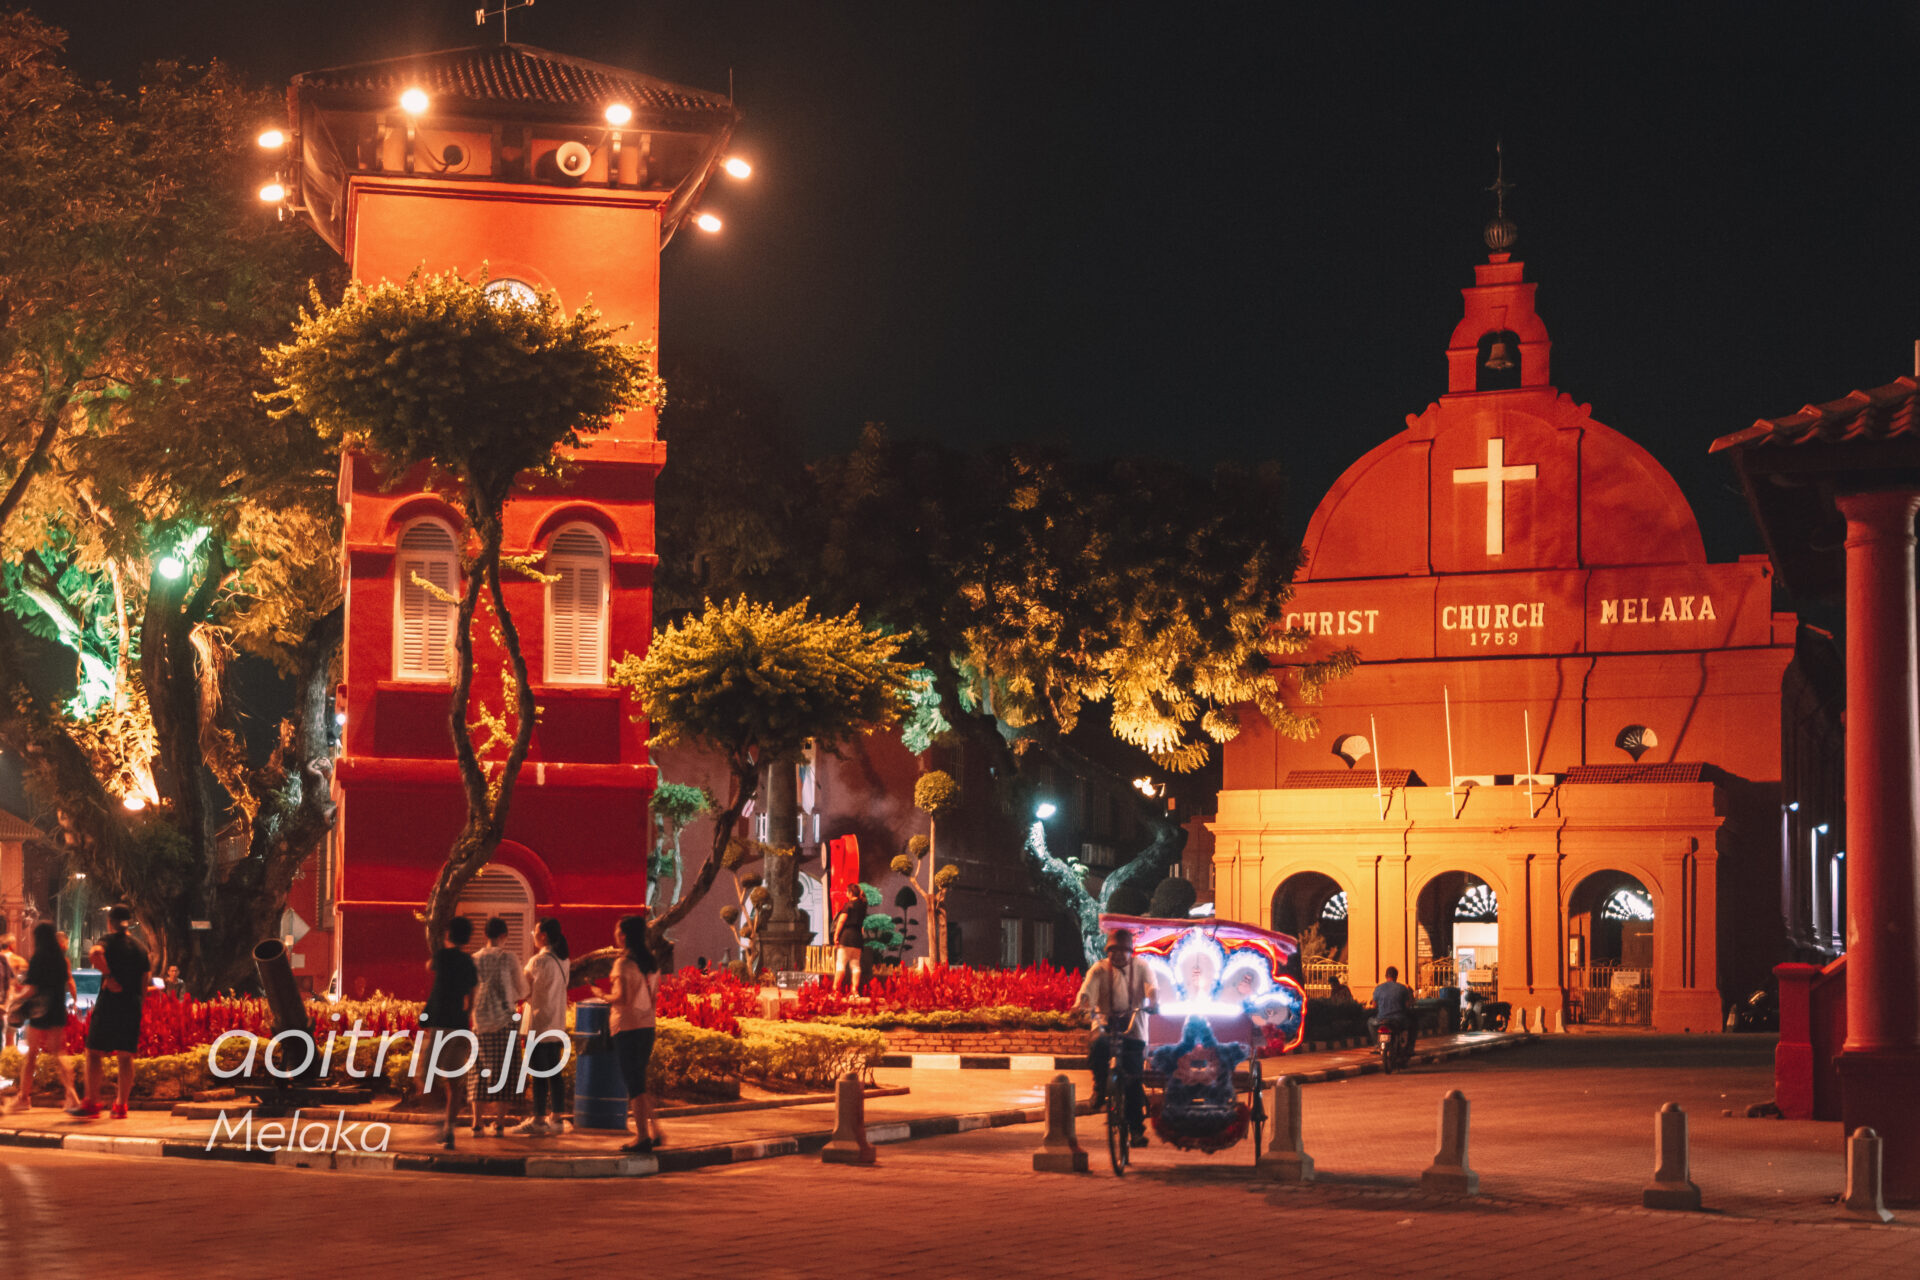 Dutch Square Melaka Night View